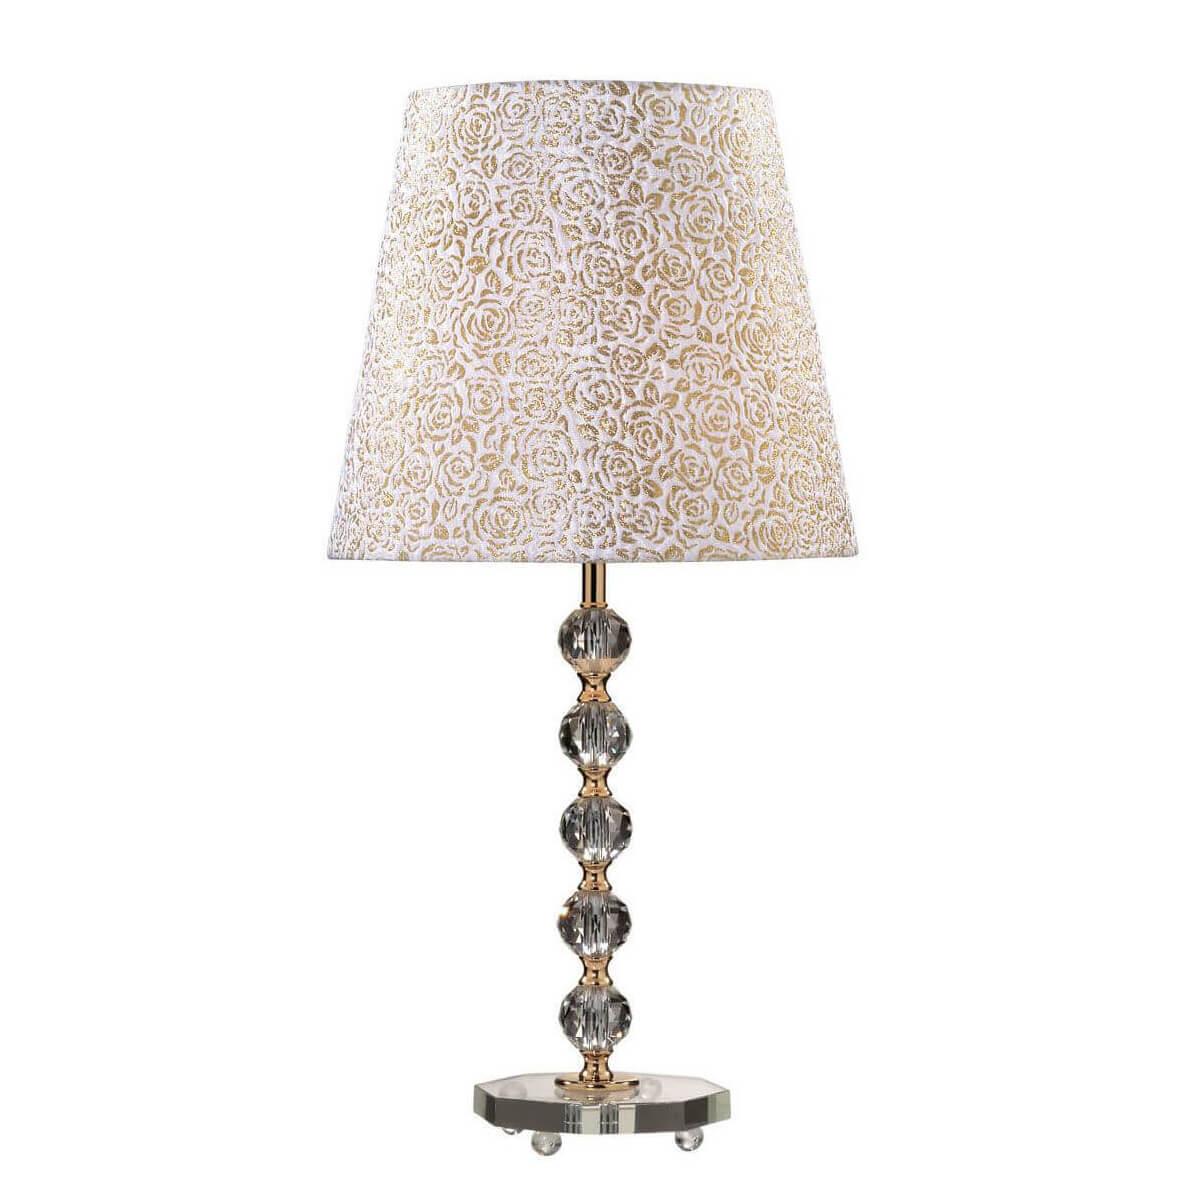 Настольная лампа Ideal Lux Queen TL1 Big Queen